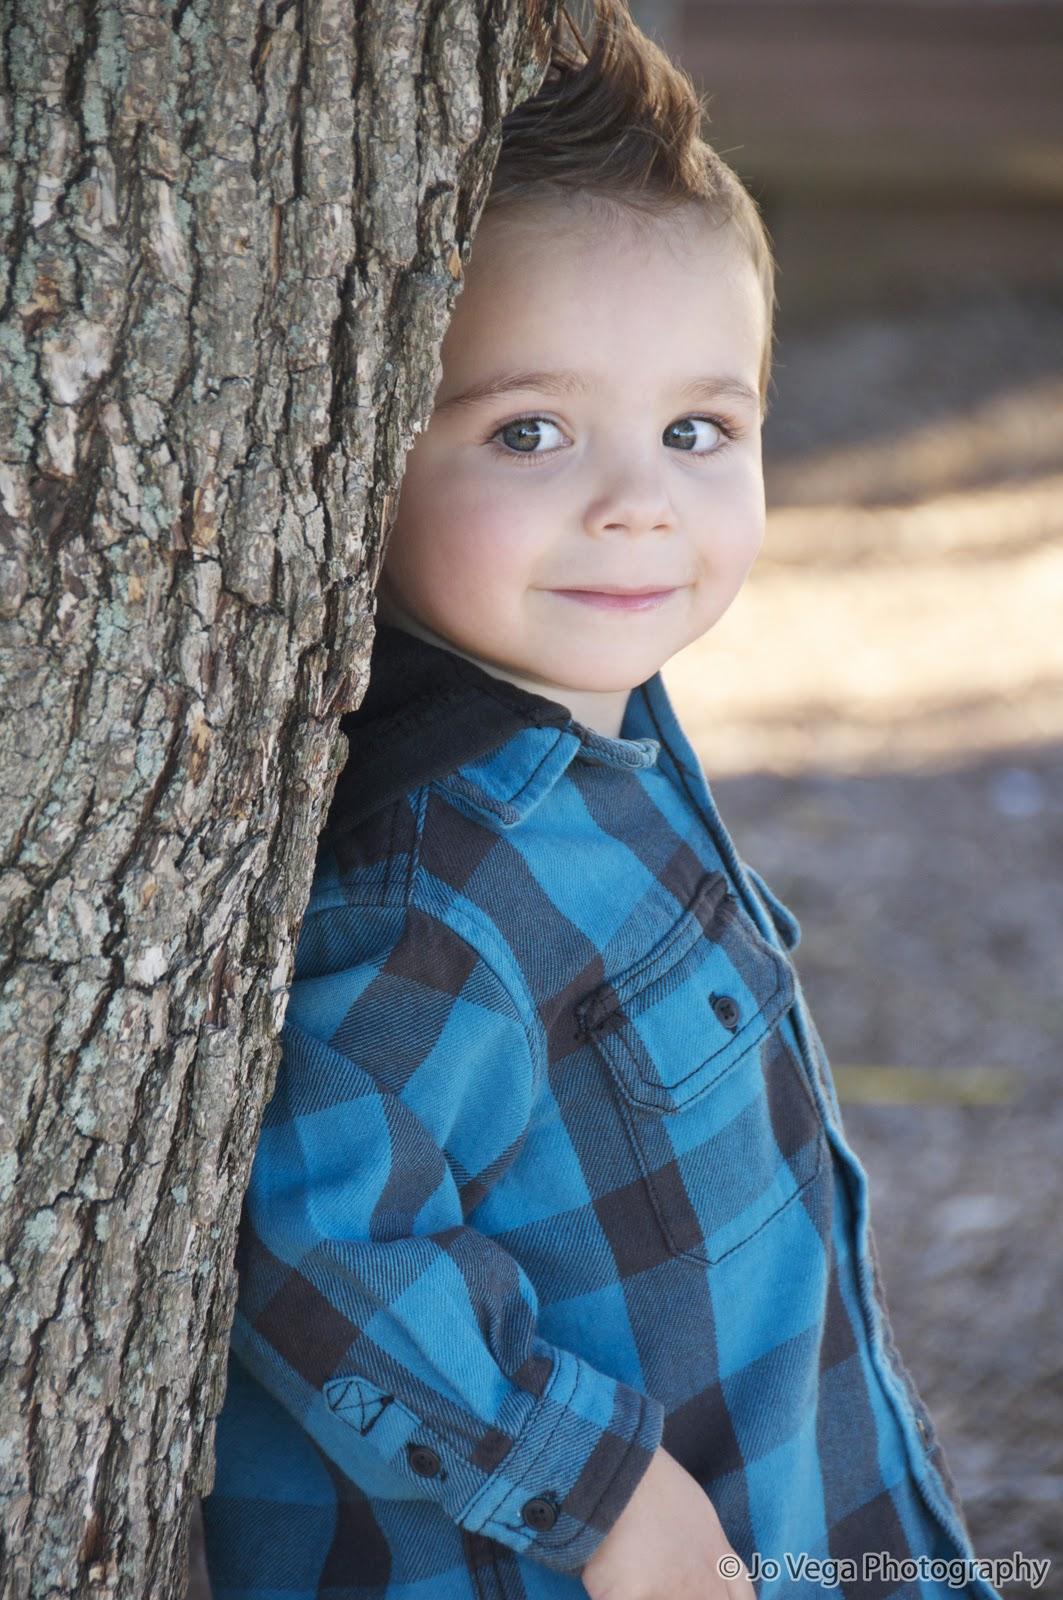 Toddler Boy Long Blonde Hair Surfer: Jo Vega Photography: Toddler Photo Shoot